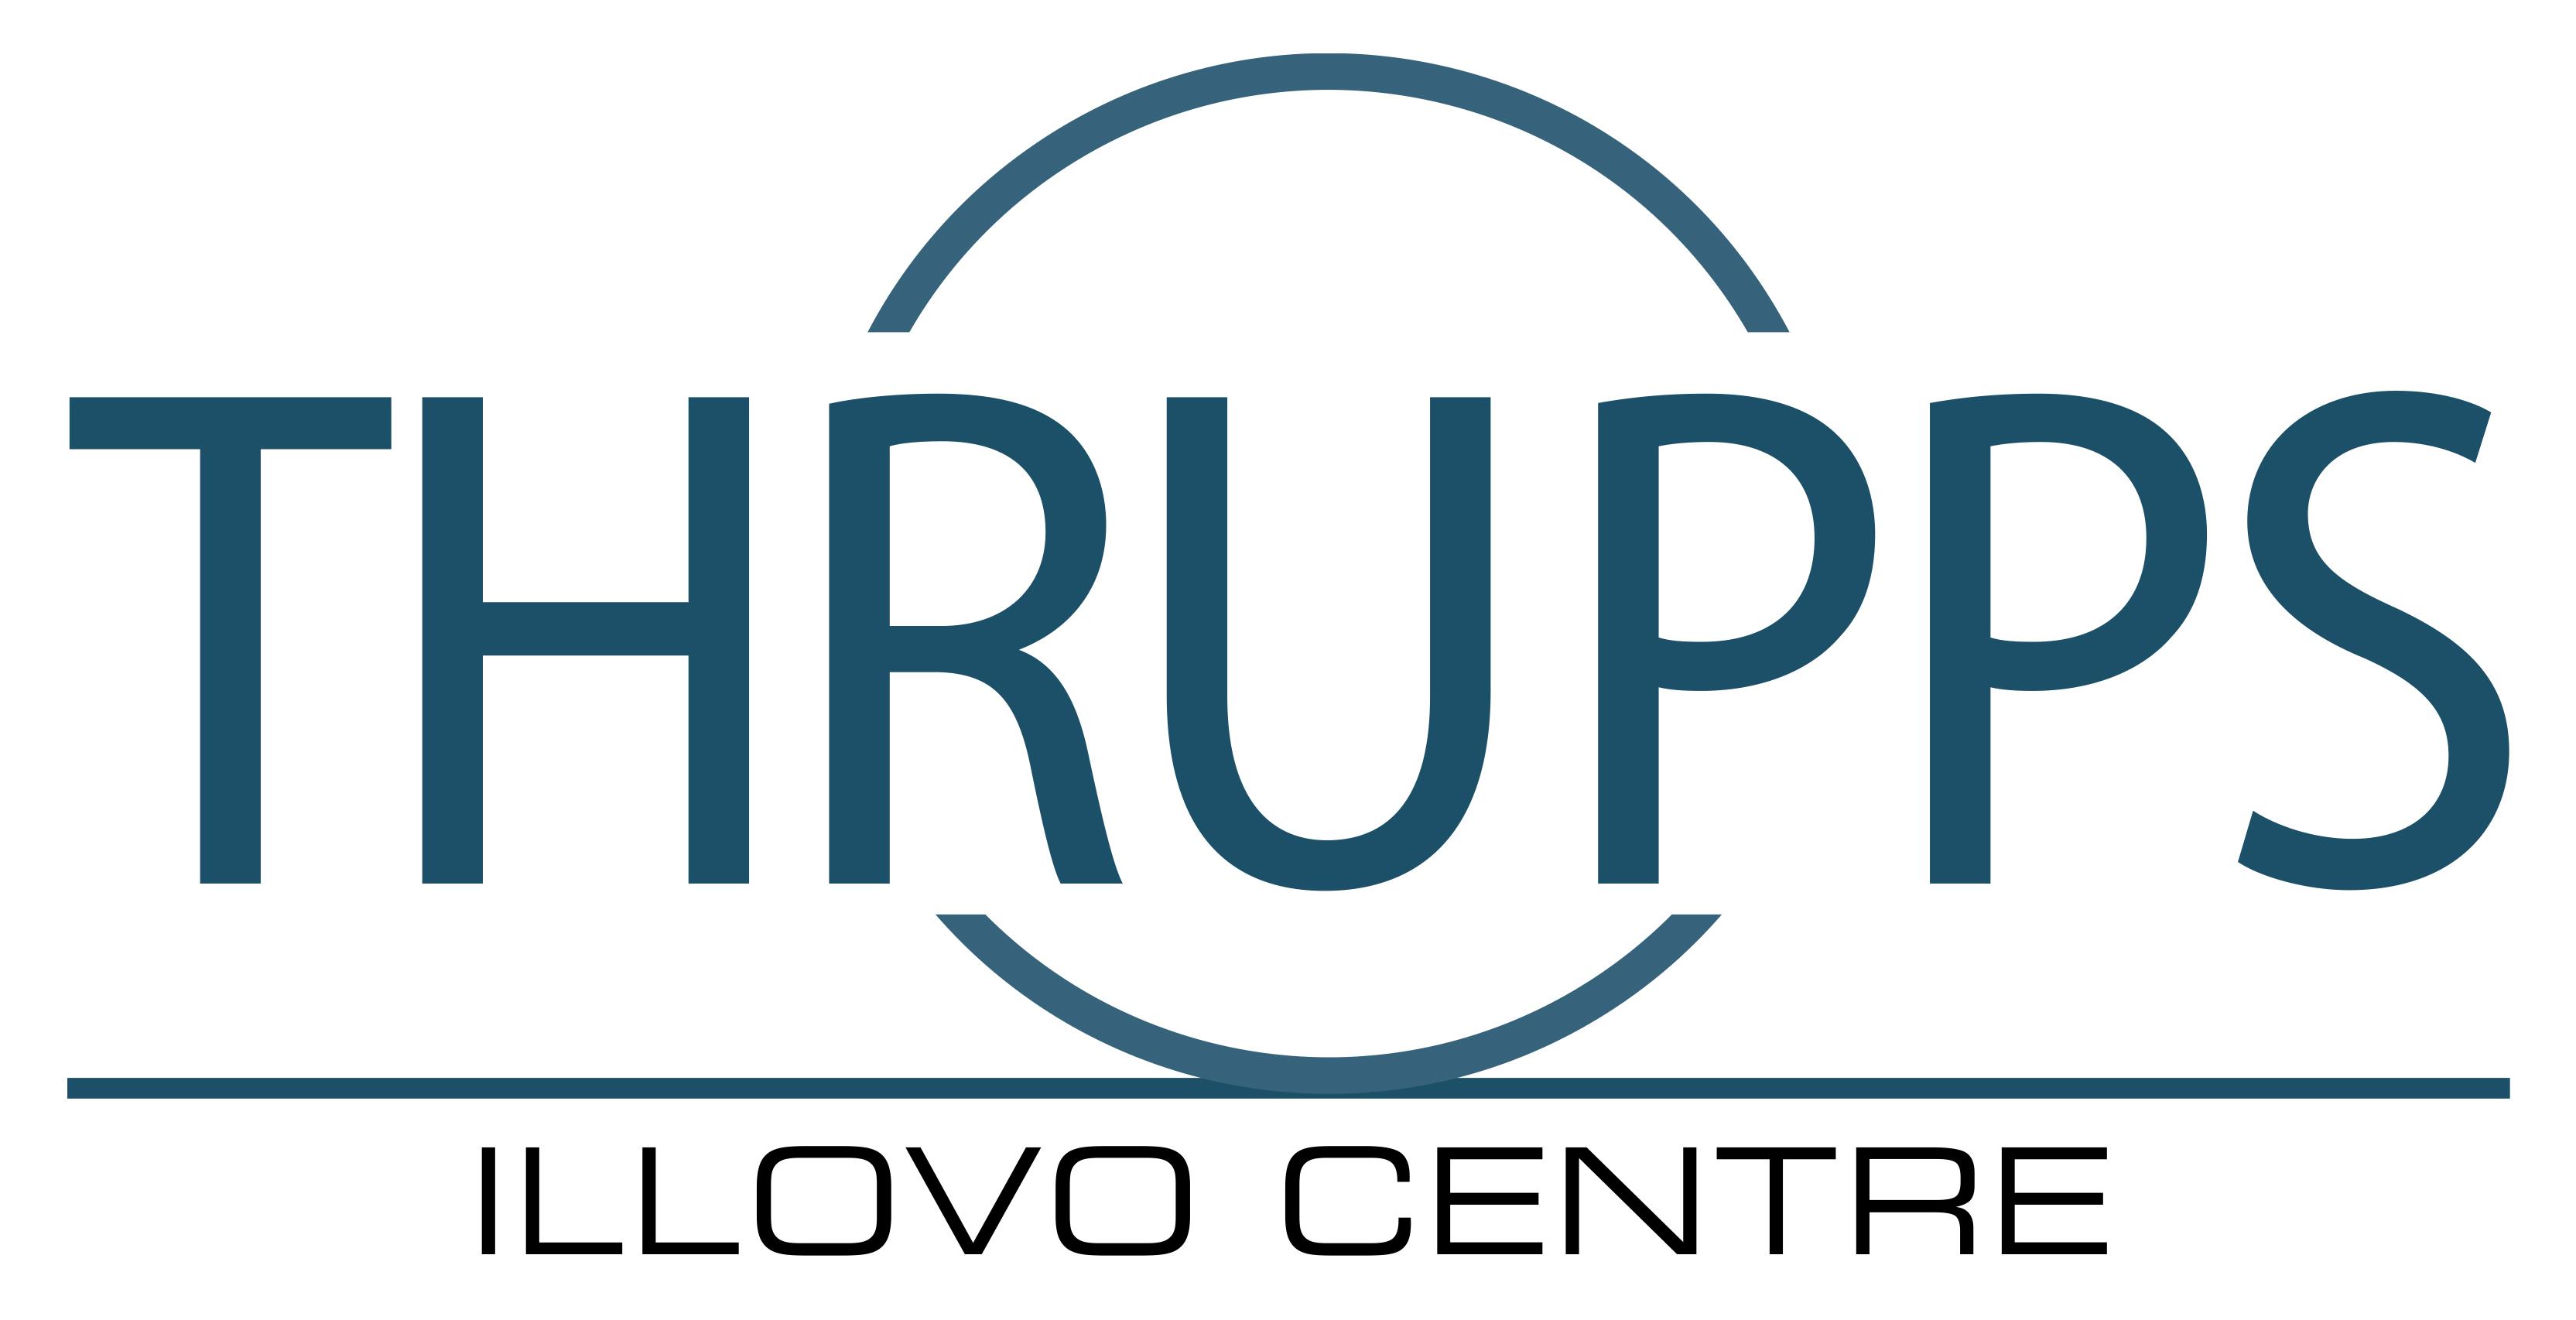 Thrupps Illovo Centre jpeg logo